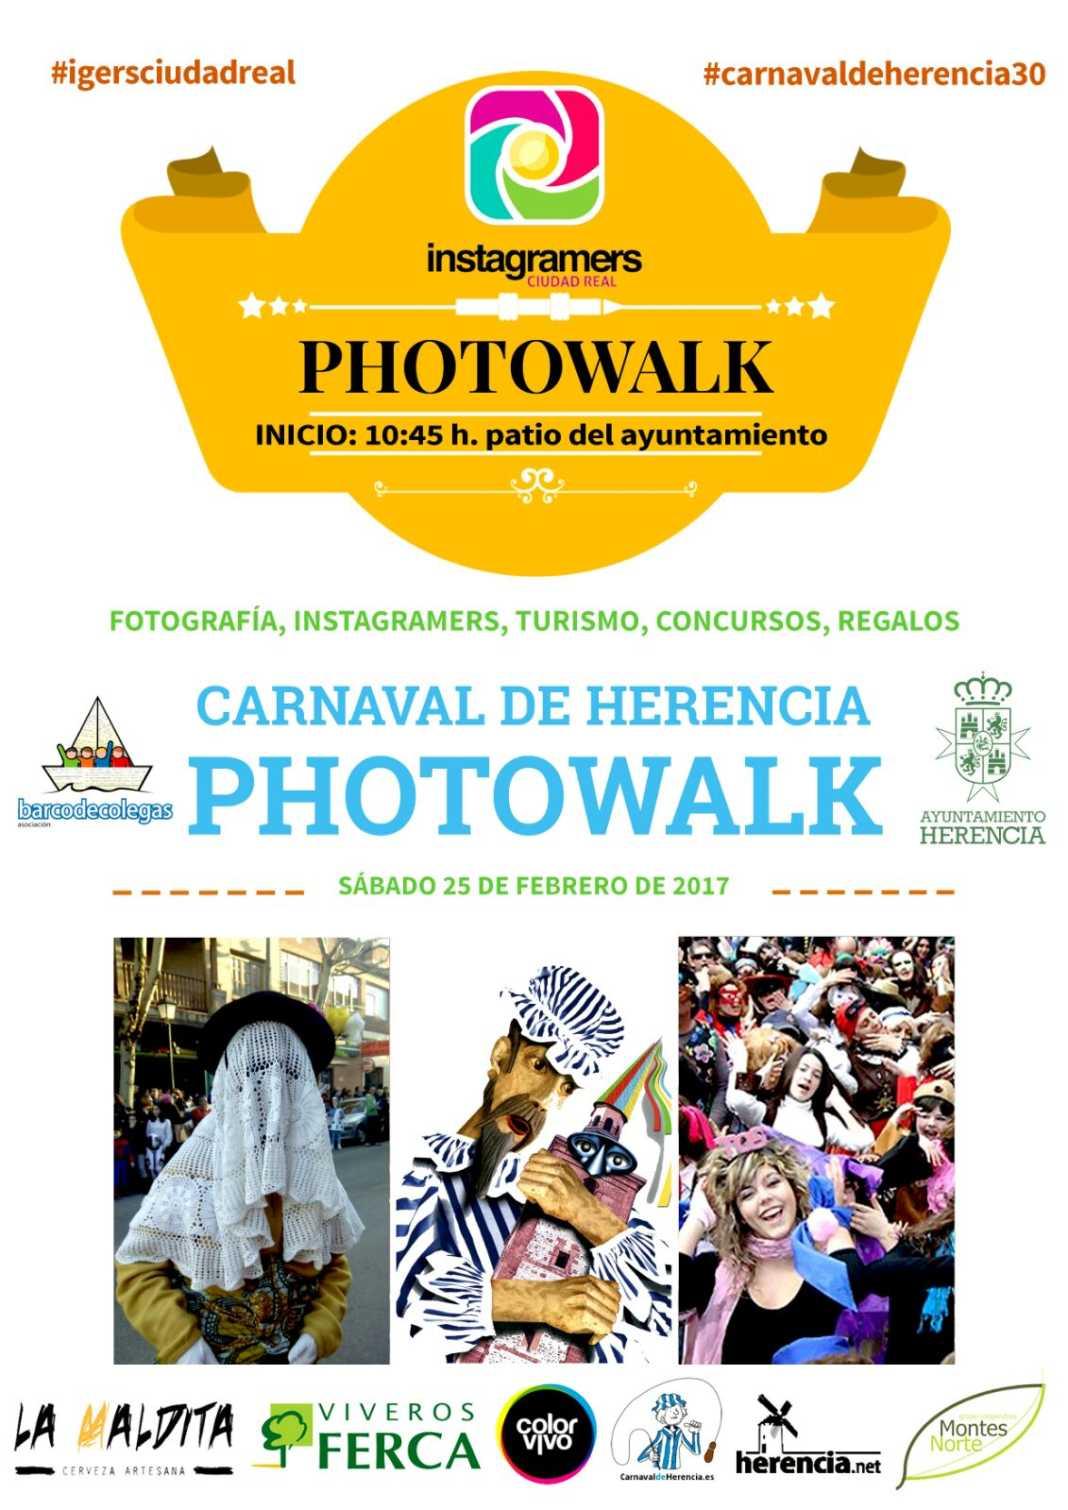 Cartel Photowalk Instagramers Carnaval de Herencia 1068x1510 - El Carnaval de Herencia será punto de encuentro para los instagramers